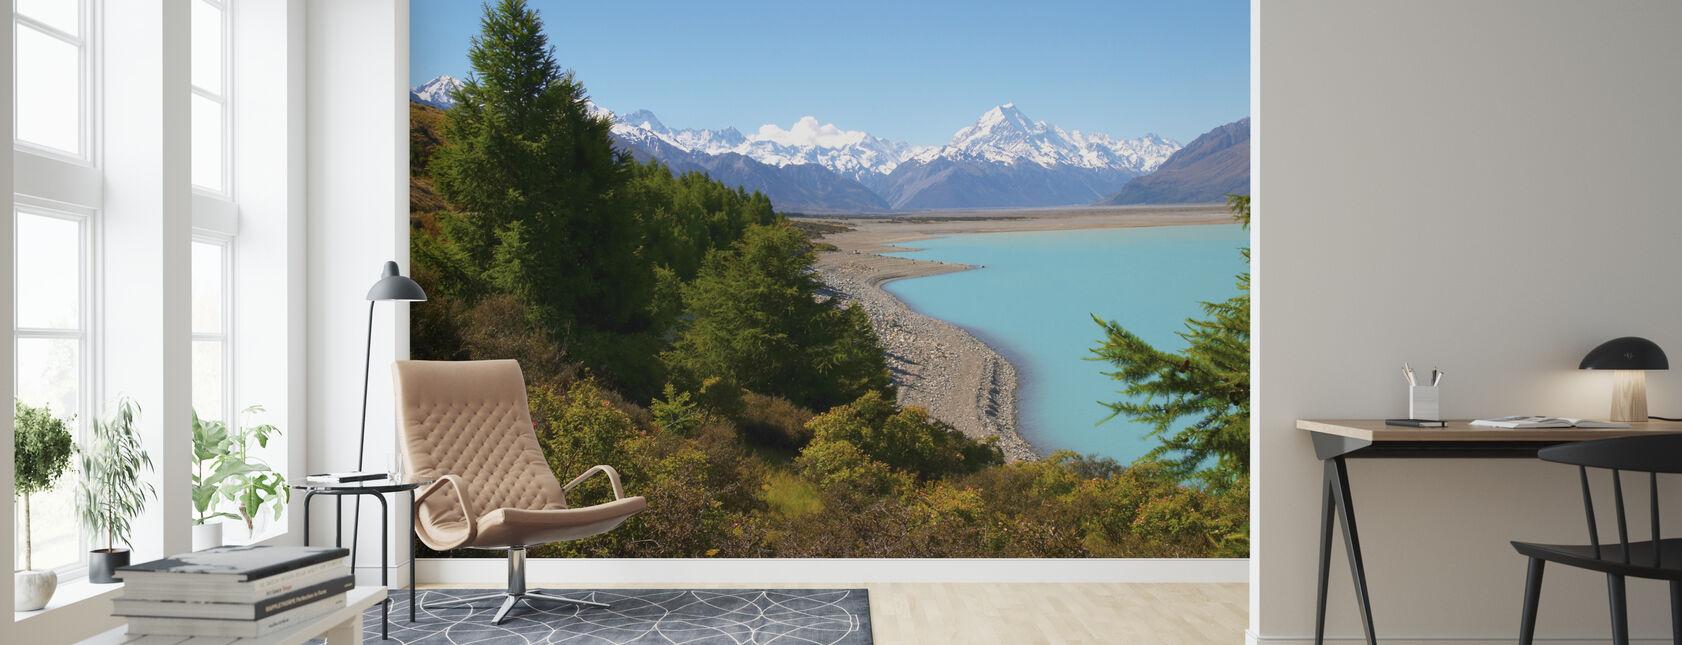 Lake Pukaki - Wallpaper - Living Room